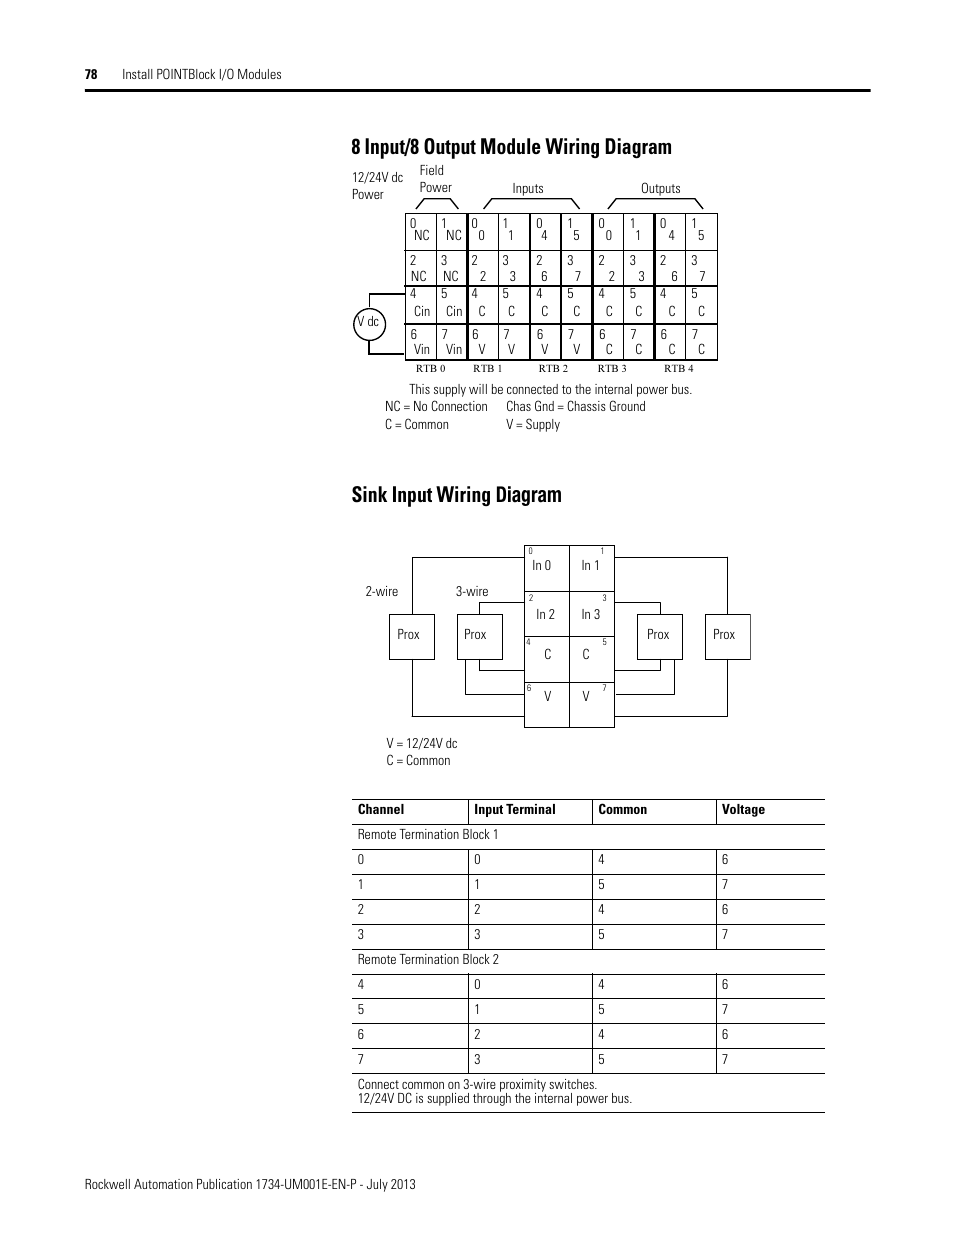 8 input 8 output module wiring diagram sink input wiring. Black Bedroom Furniture Sets. Home Design Ideas